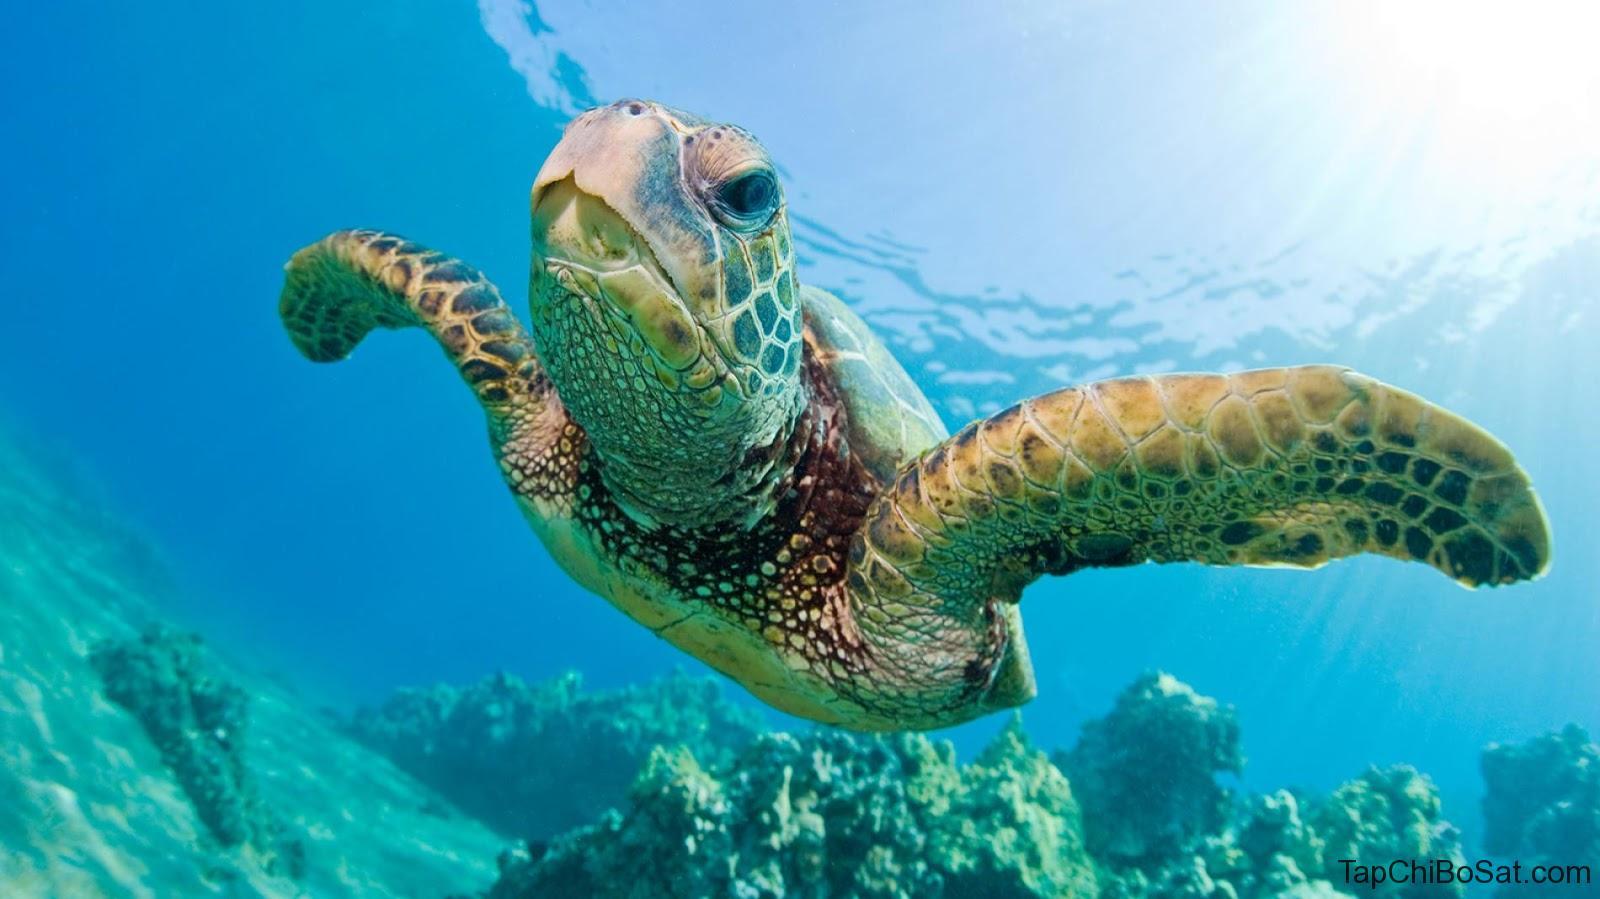 Rùa biển xanh- Green Sea Turtle